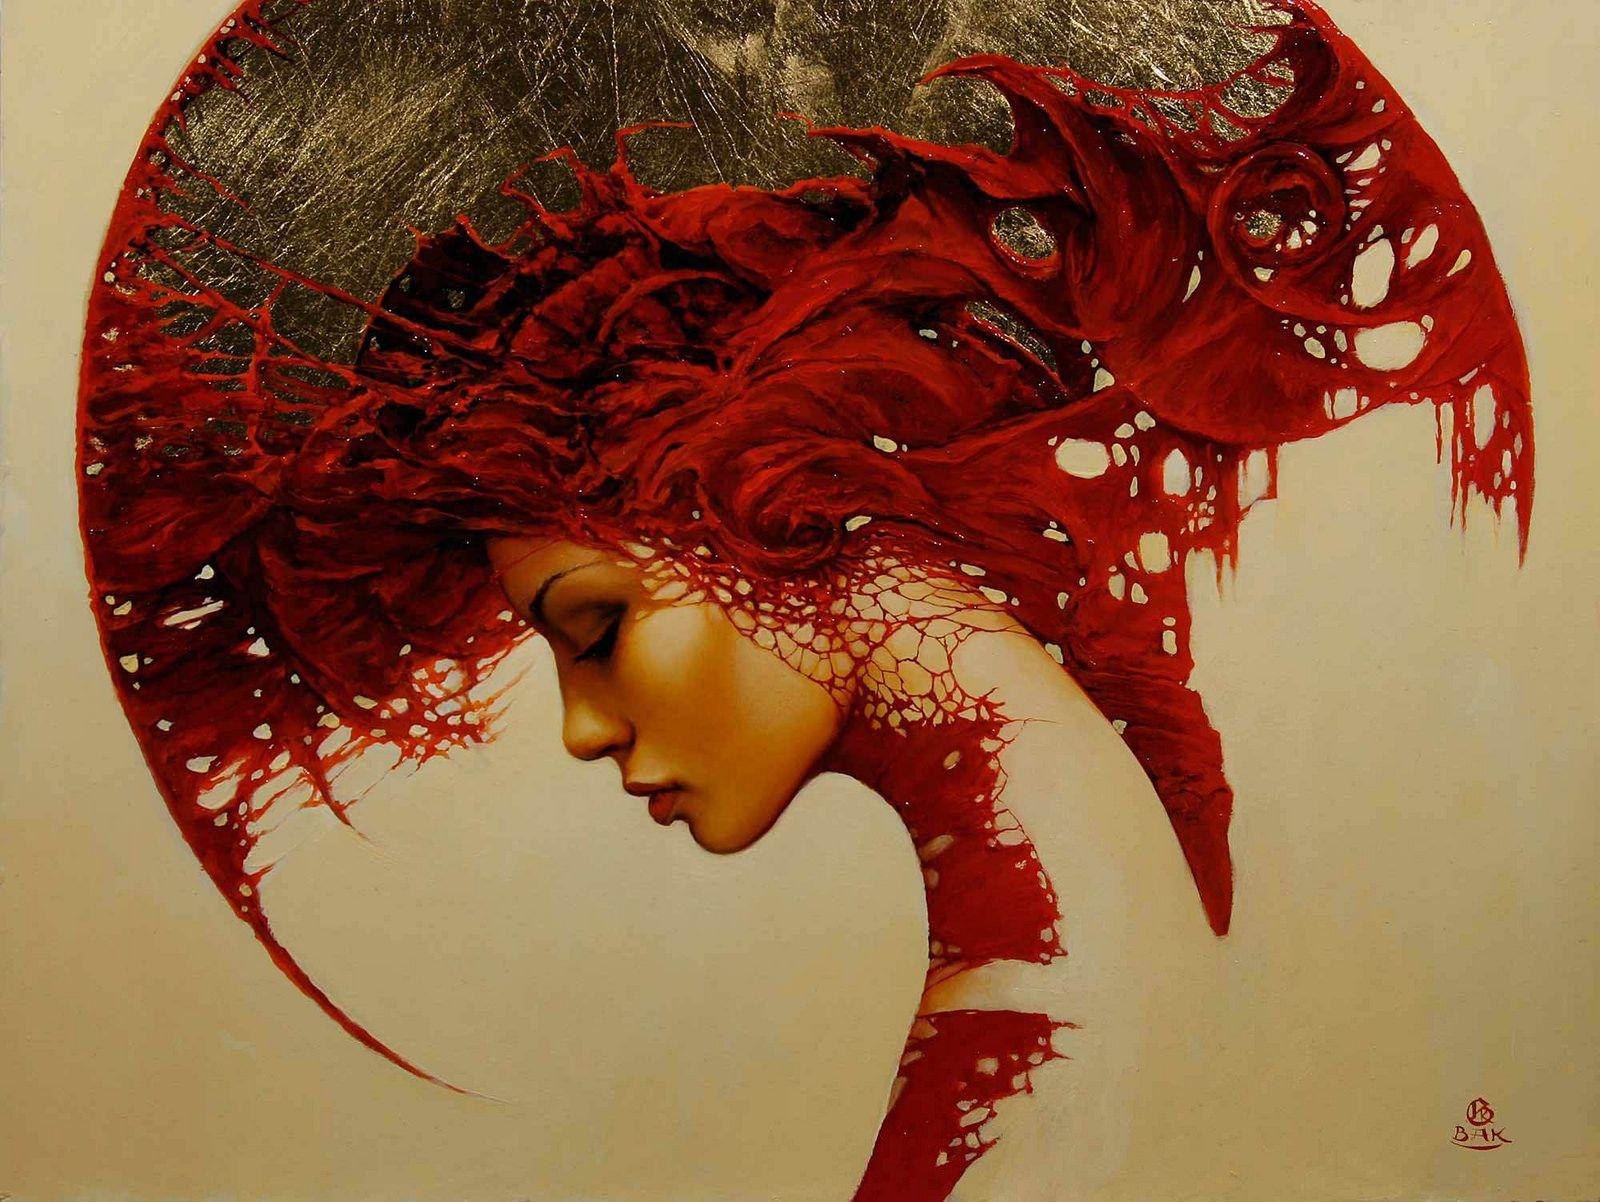 https://flic.kr/p/xD96XC | art-woman-shapes-patterns-fantasy-gothic-red